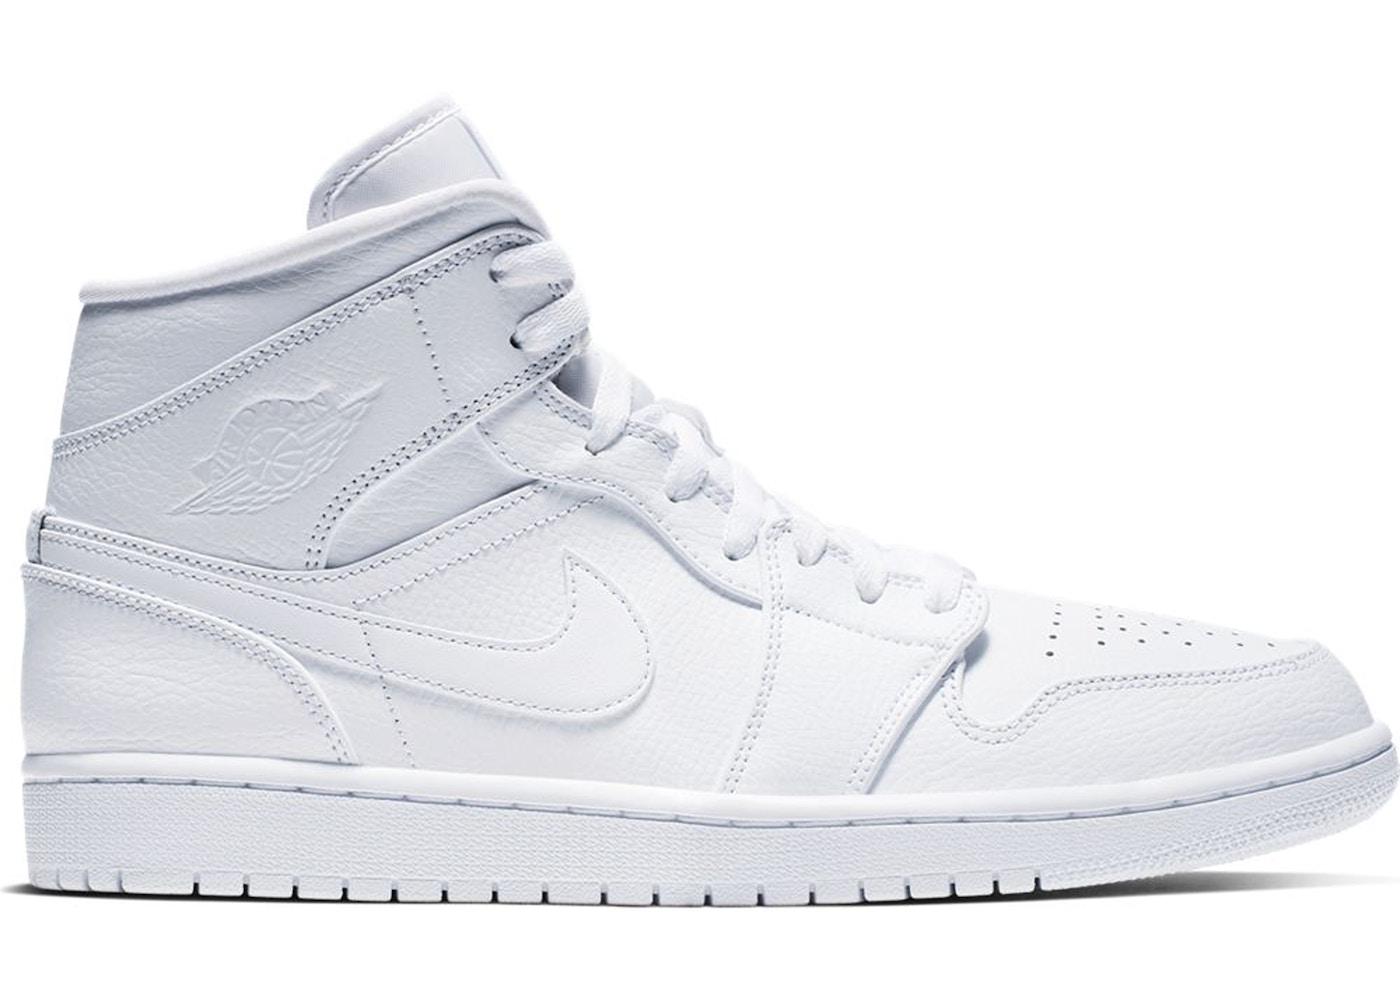 Jordan 1 Mid Triple White 2019 554724 129